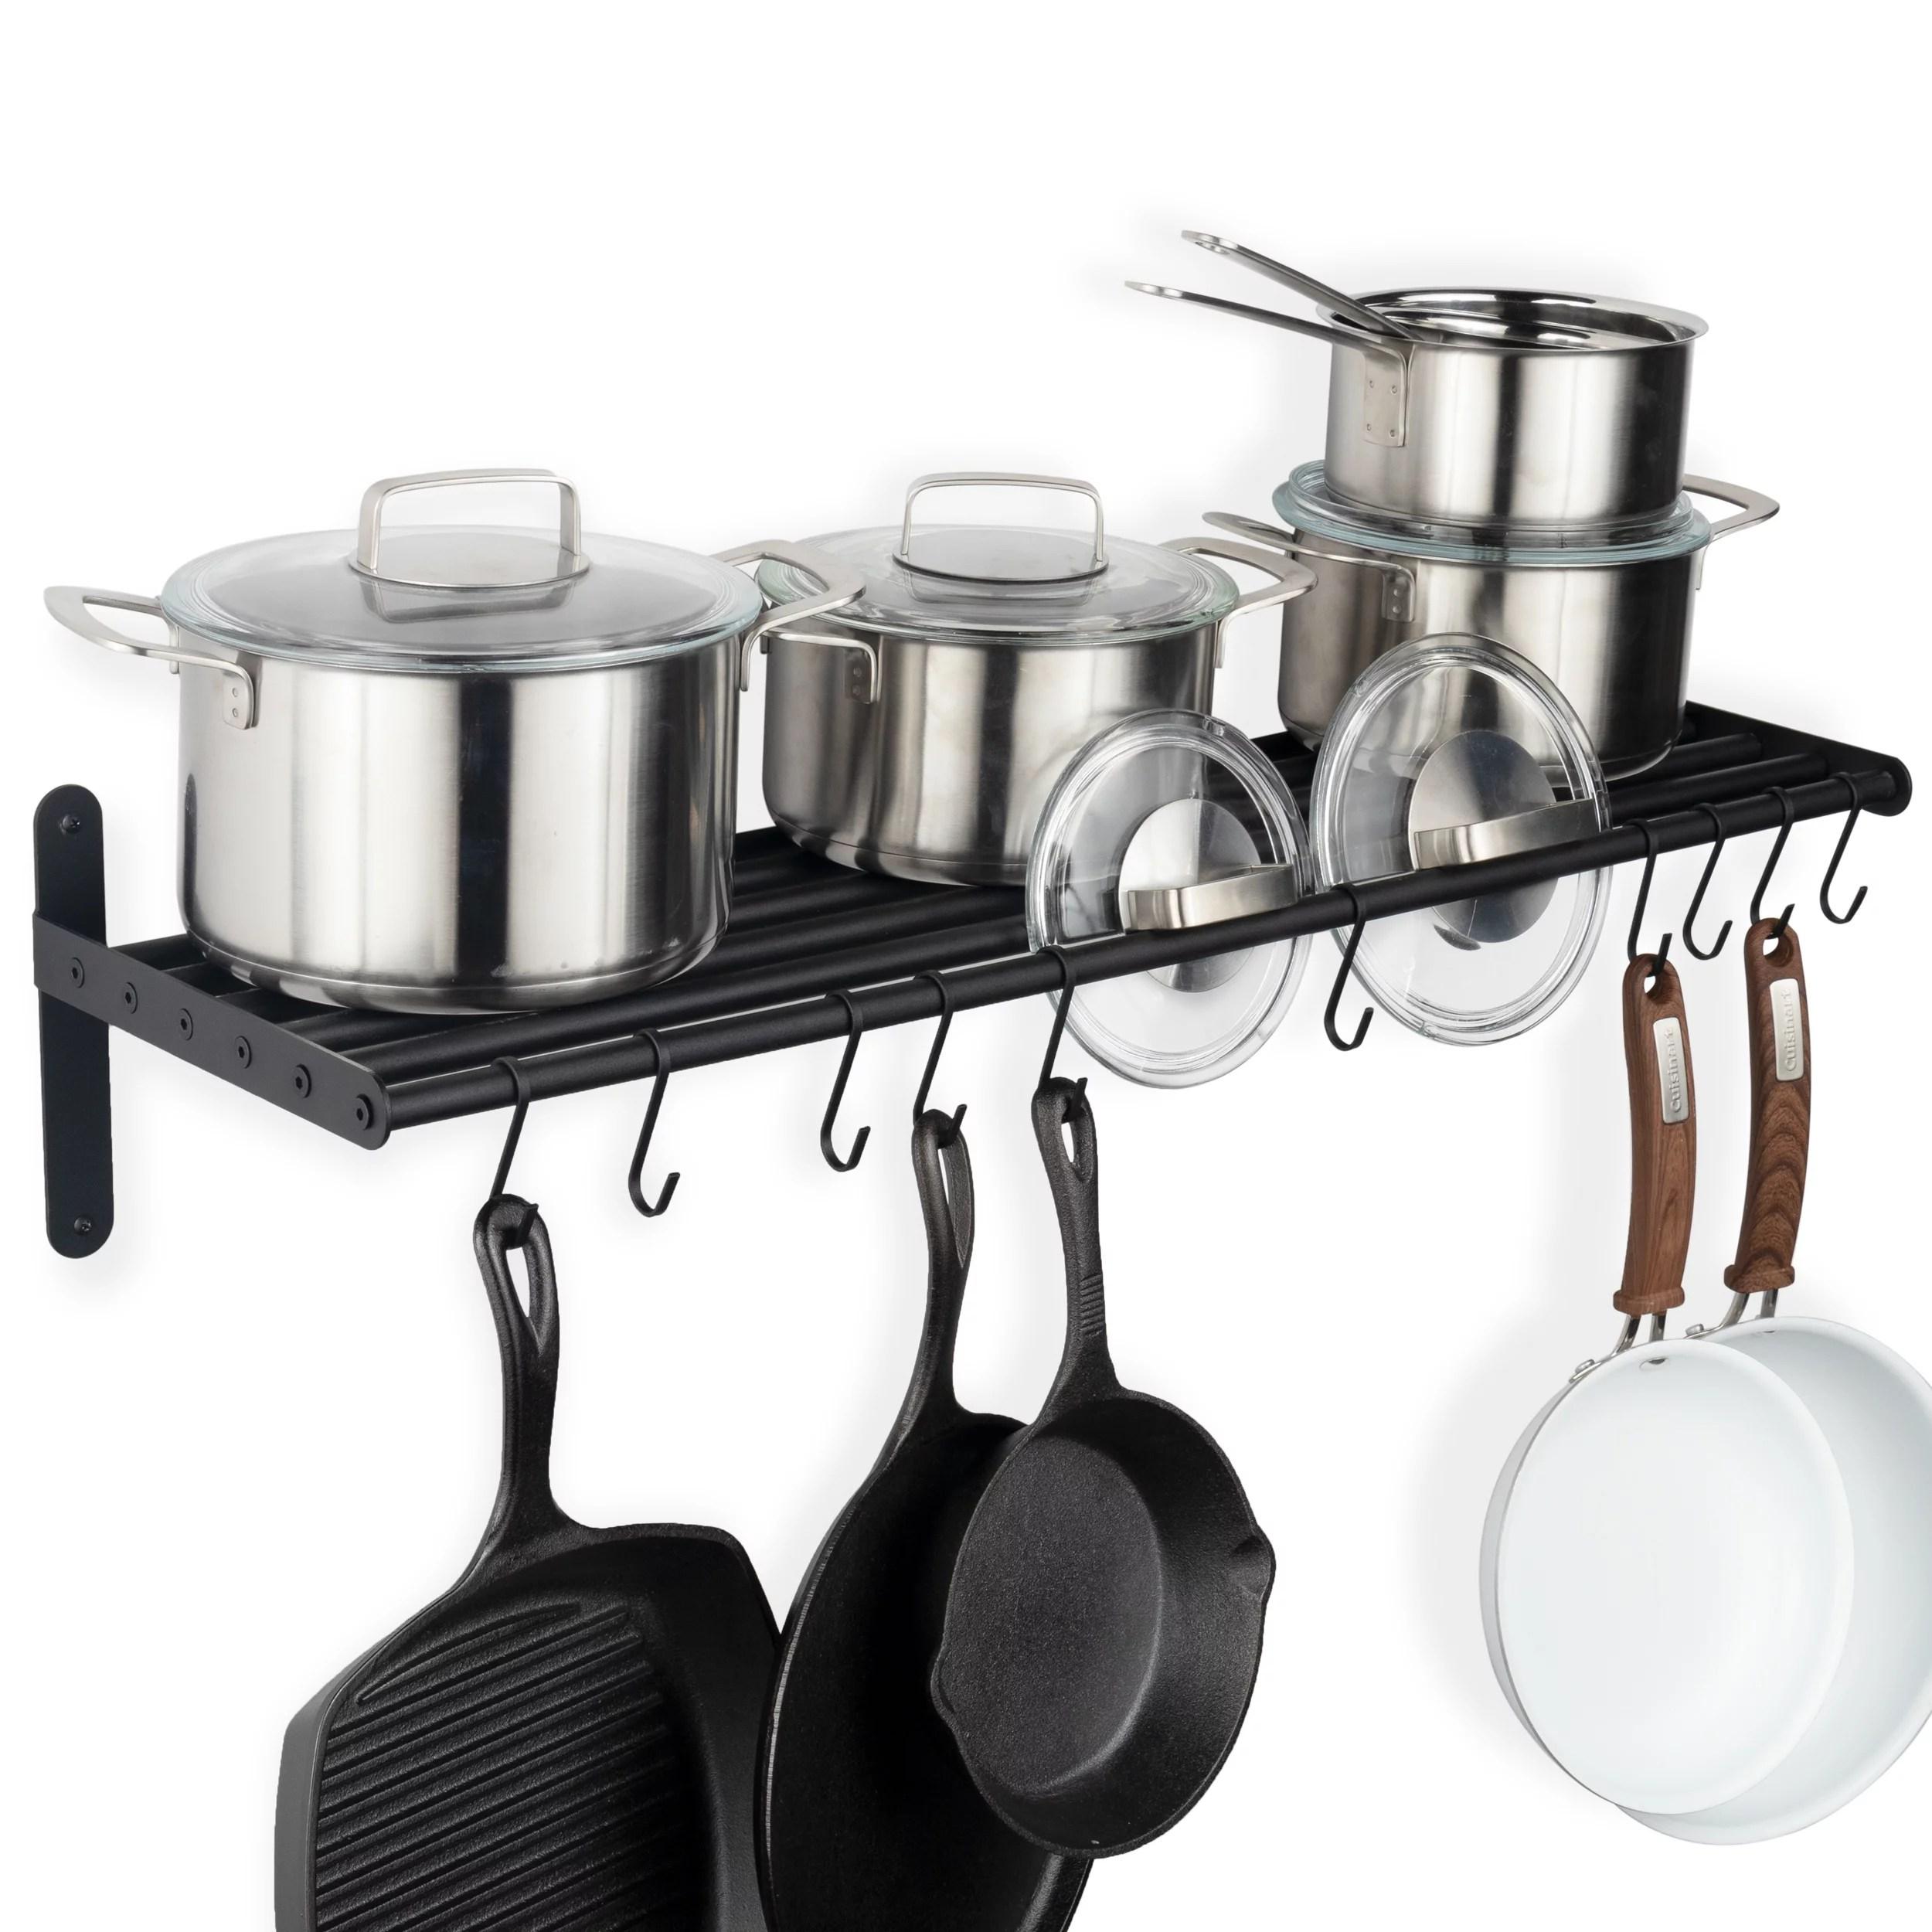 wallniture lyon wall mounted shelf with 10 s hooks for kitchen utensils metal frosty black